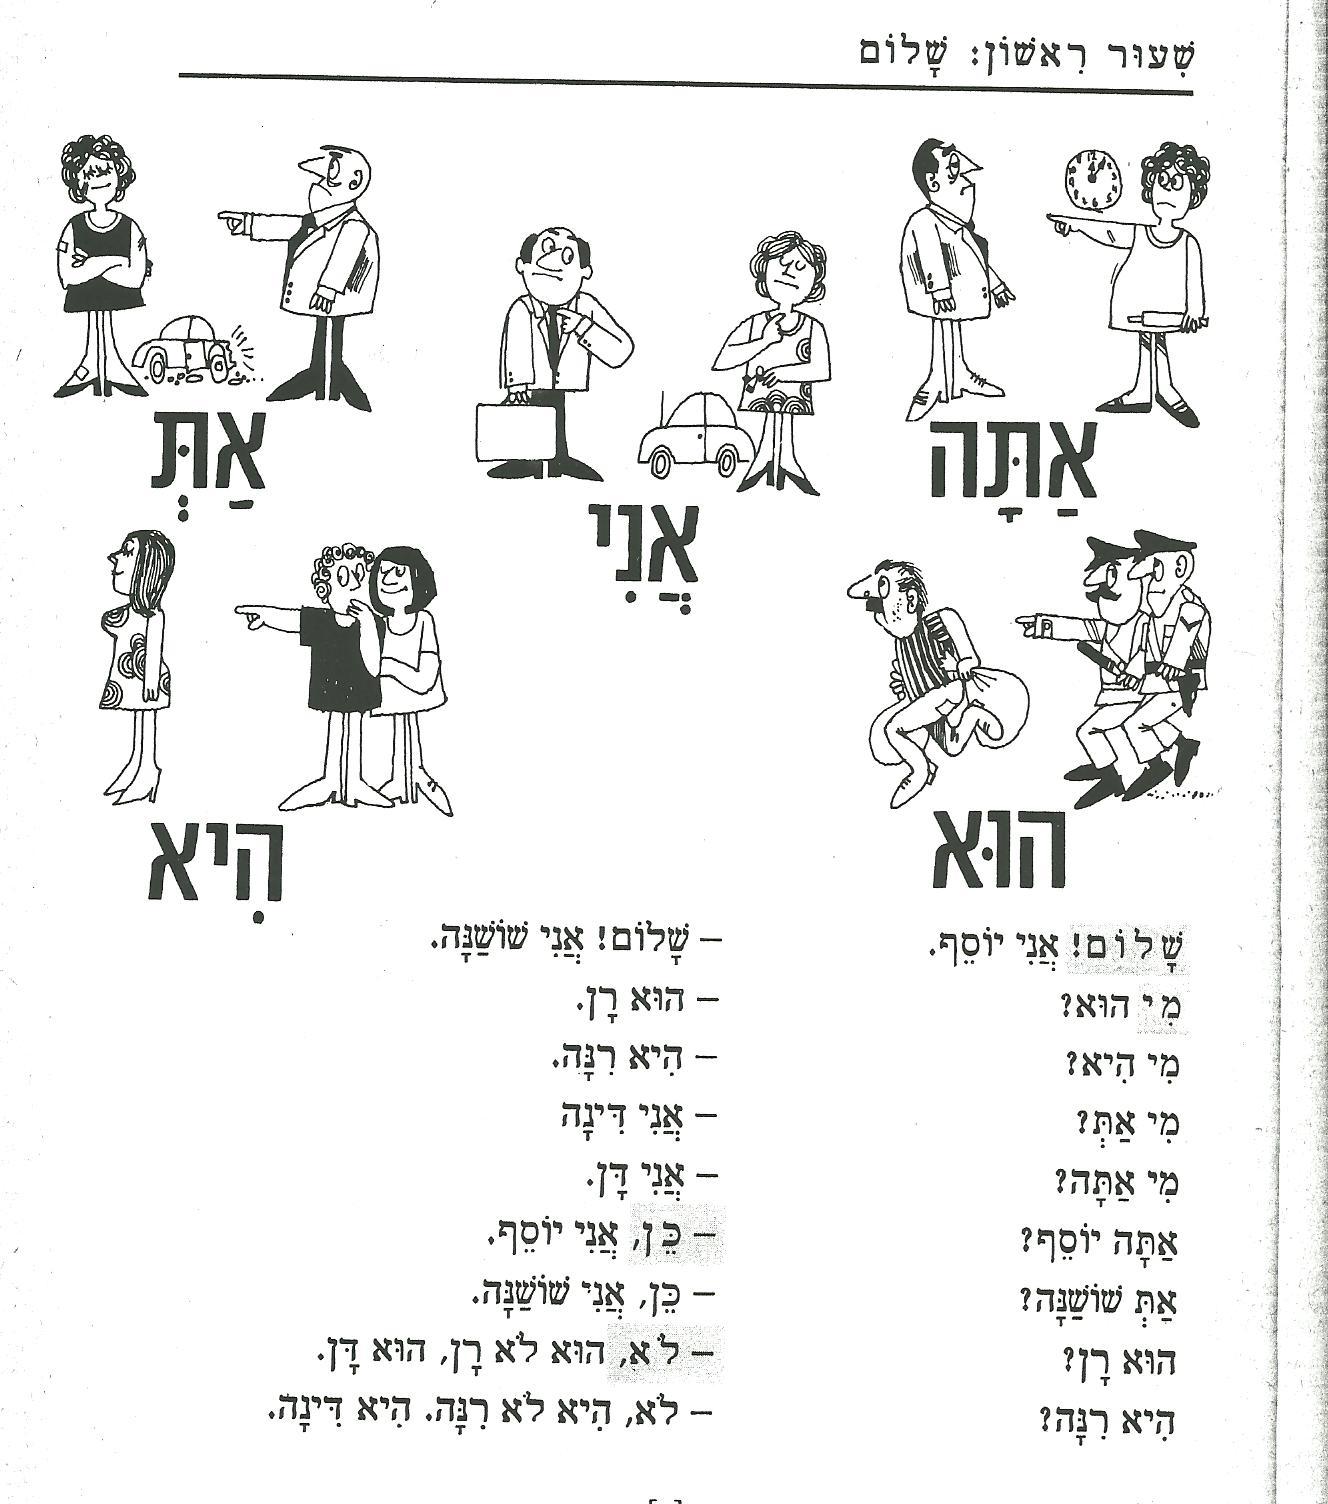 Alfabeto Hebraico Cursivo Para o Alfabeto Cursivo